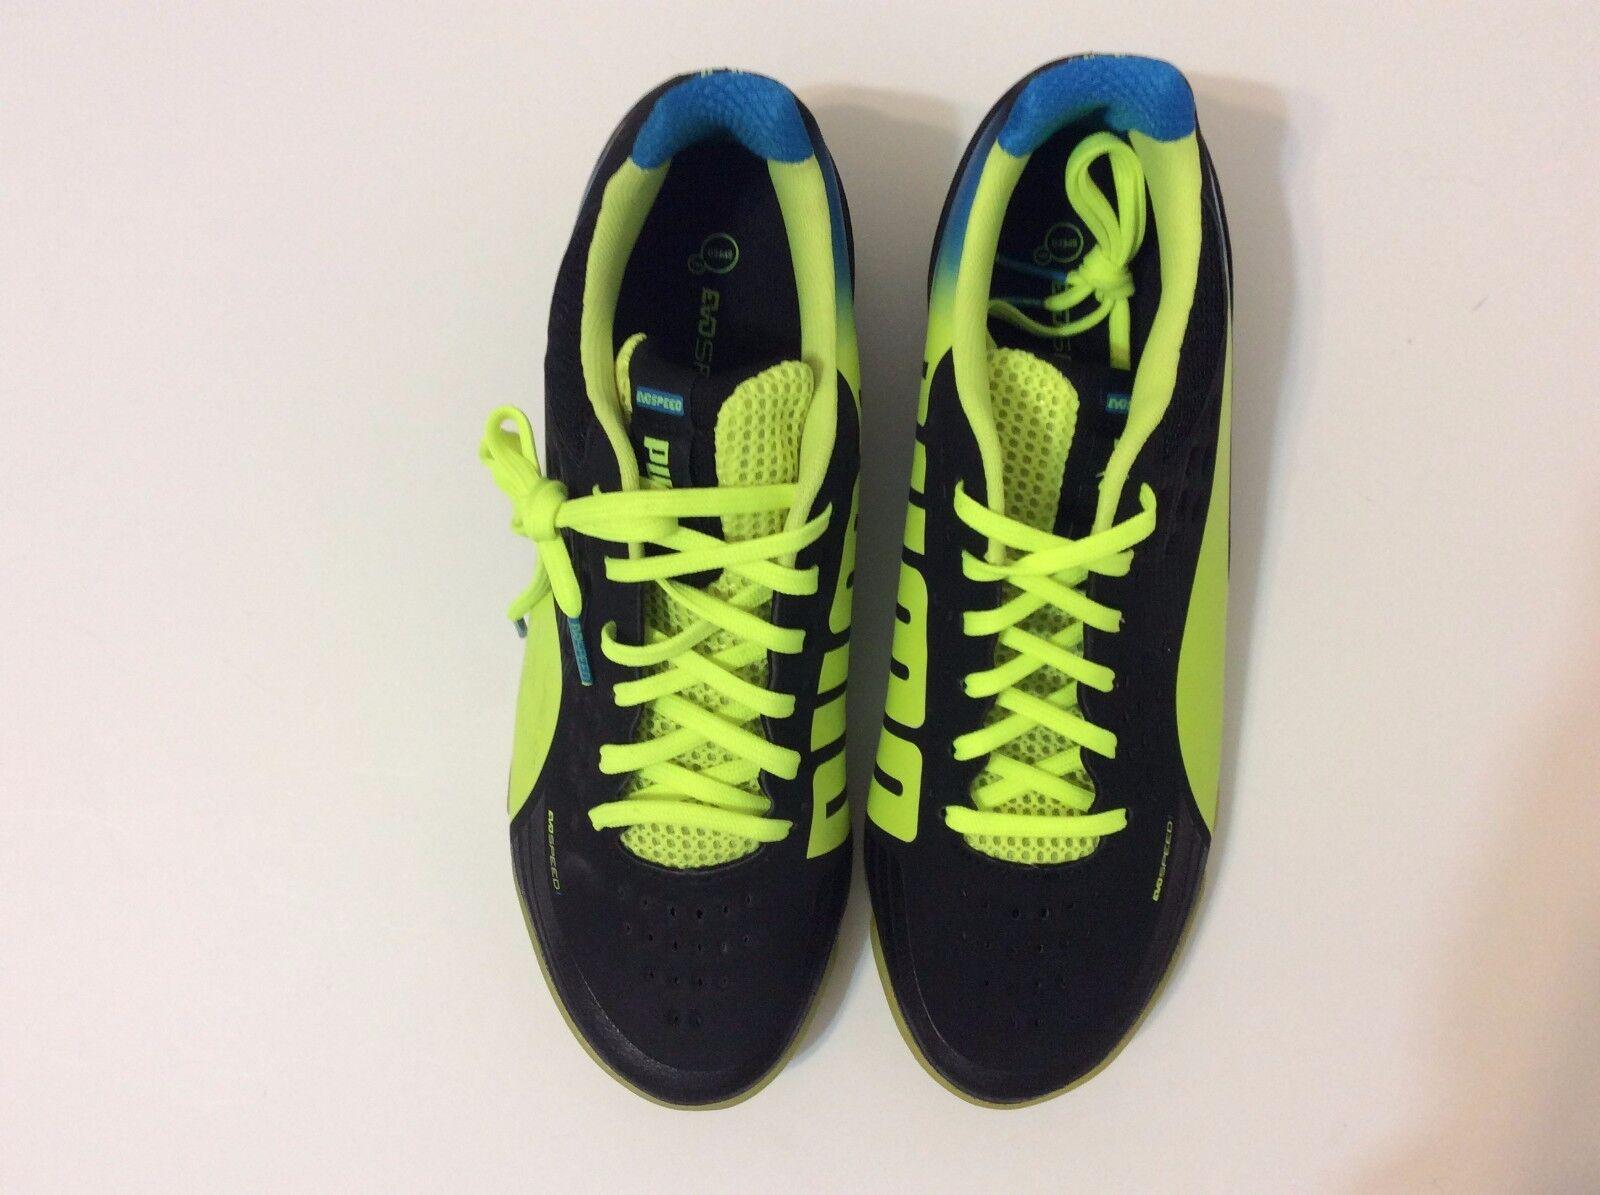 Puma Evospeed 1 Sala Mens Synthetic Athletic Sneakers